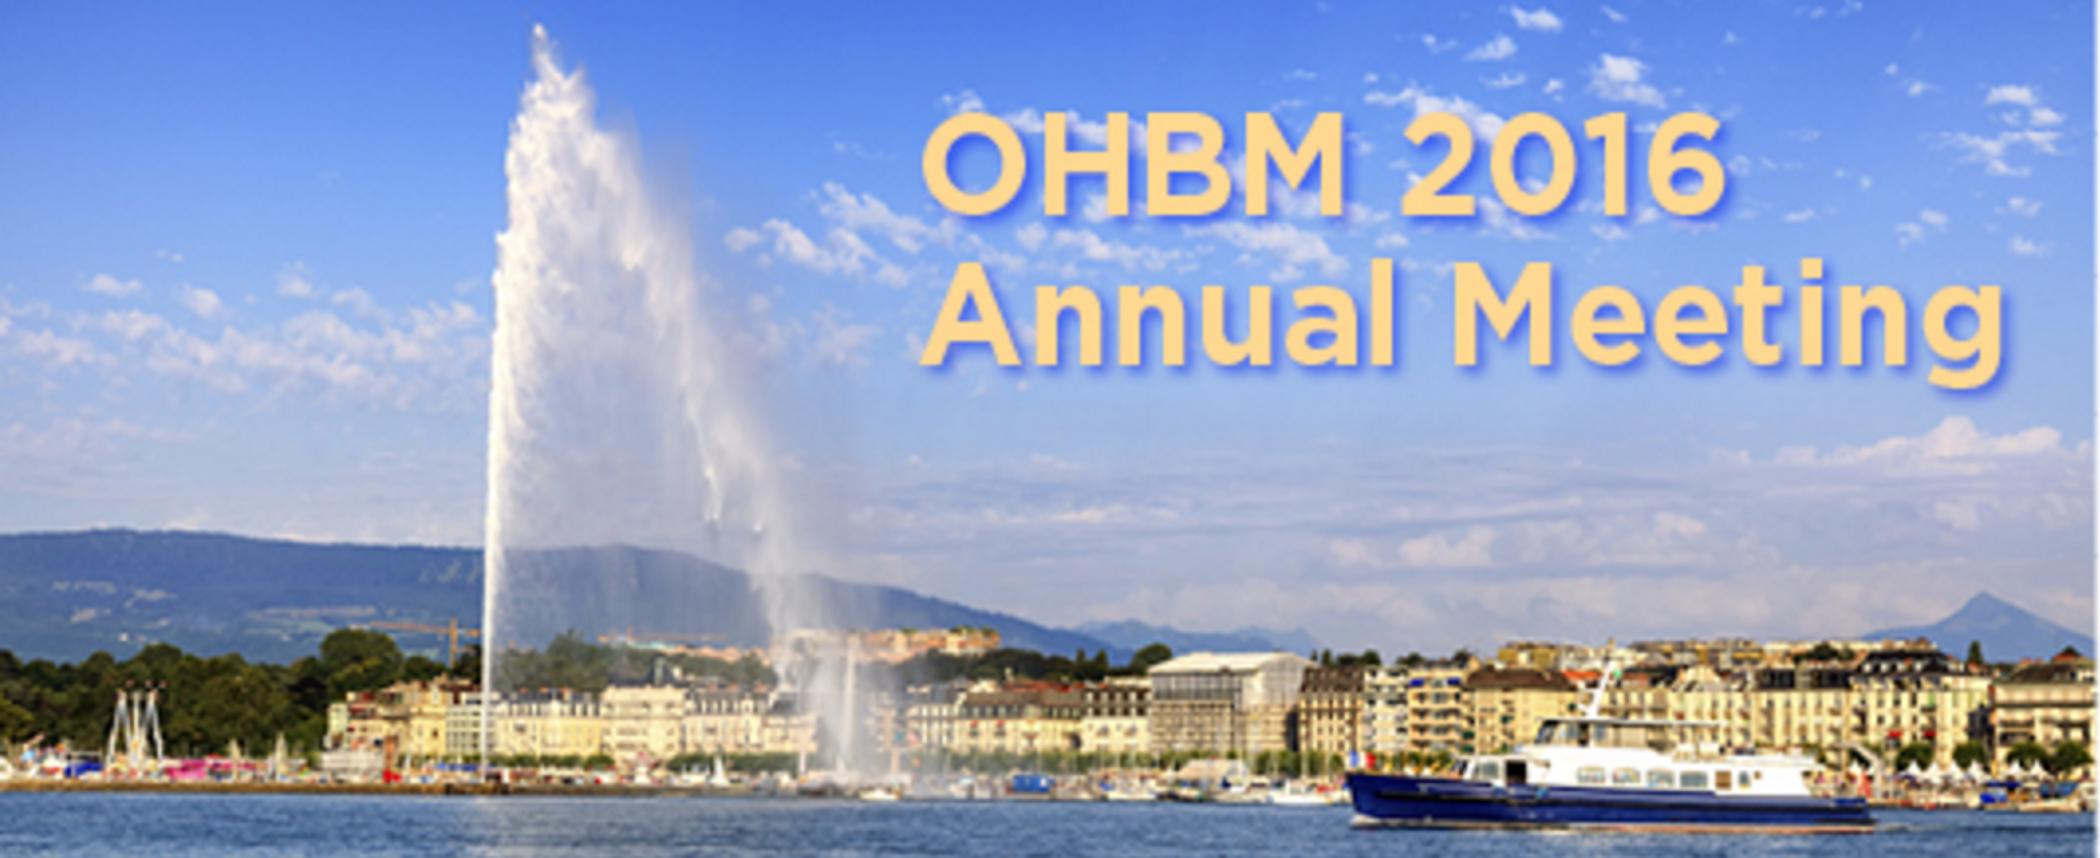 ohbm2016_larger